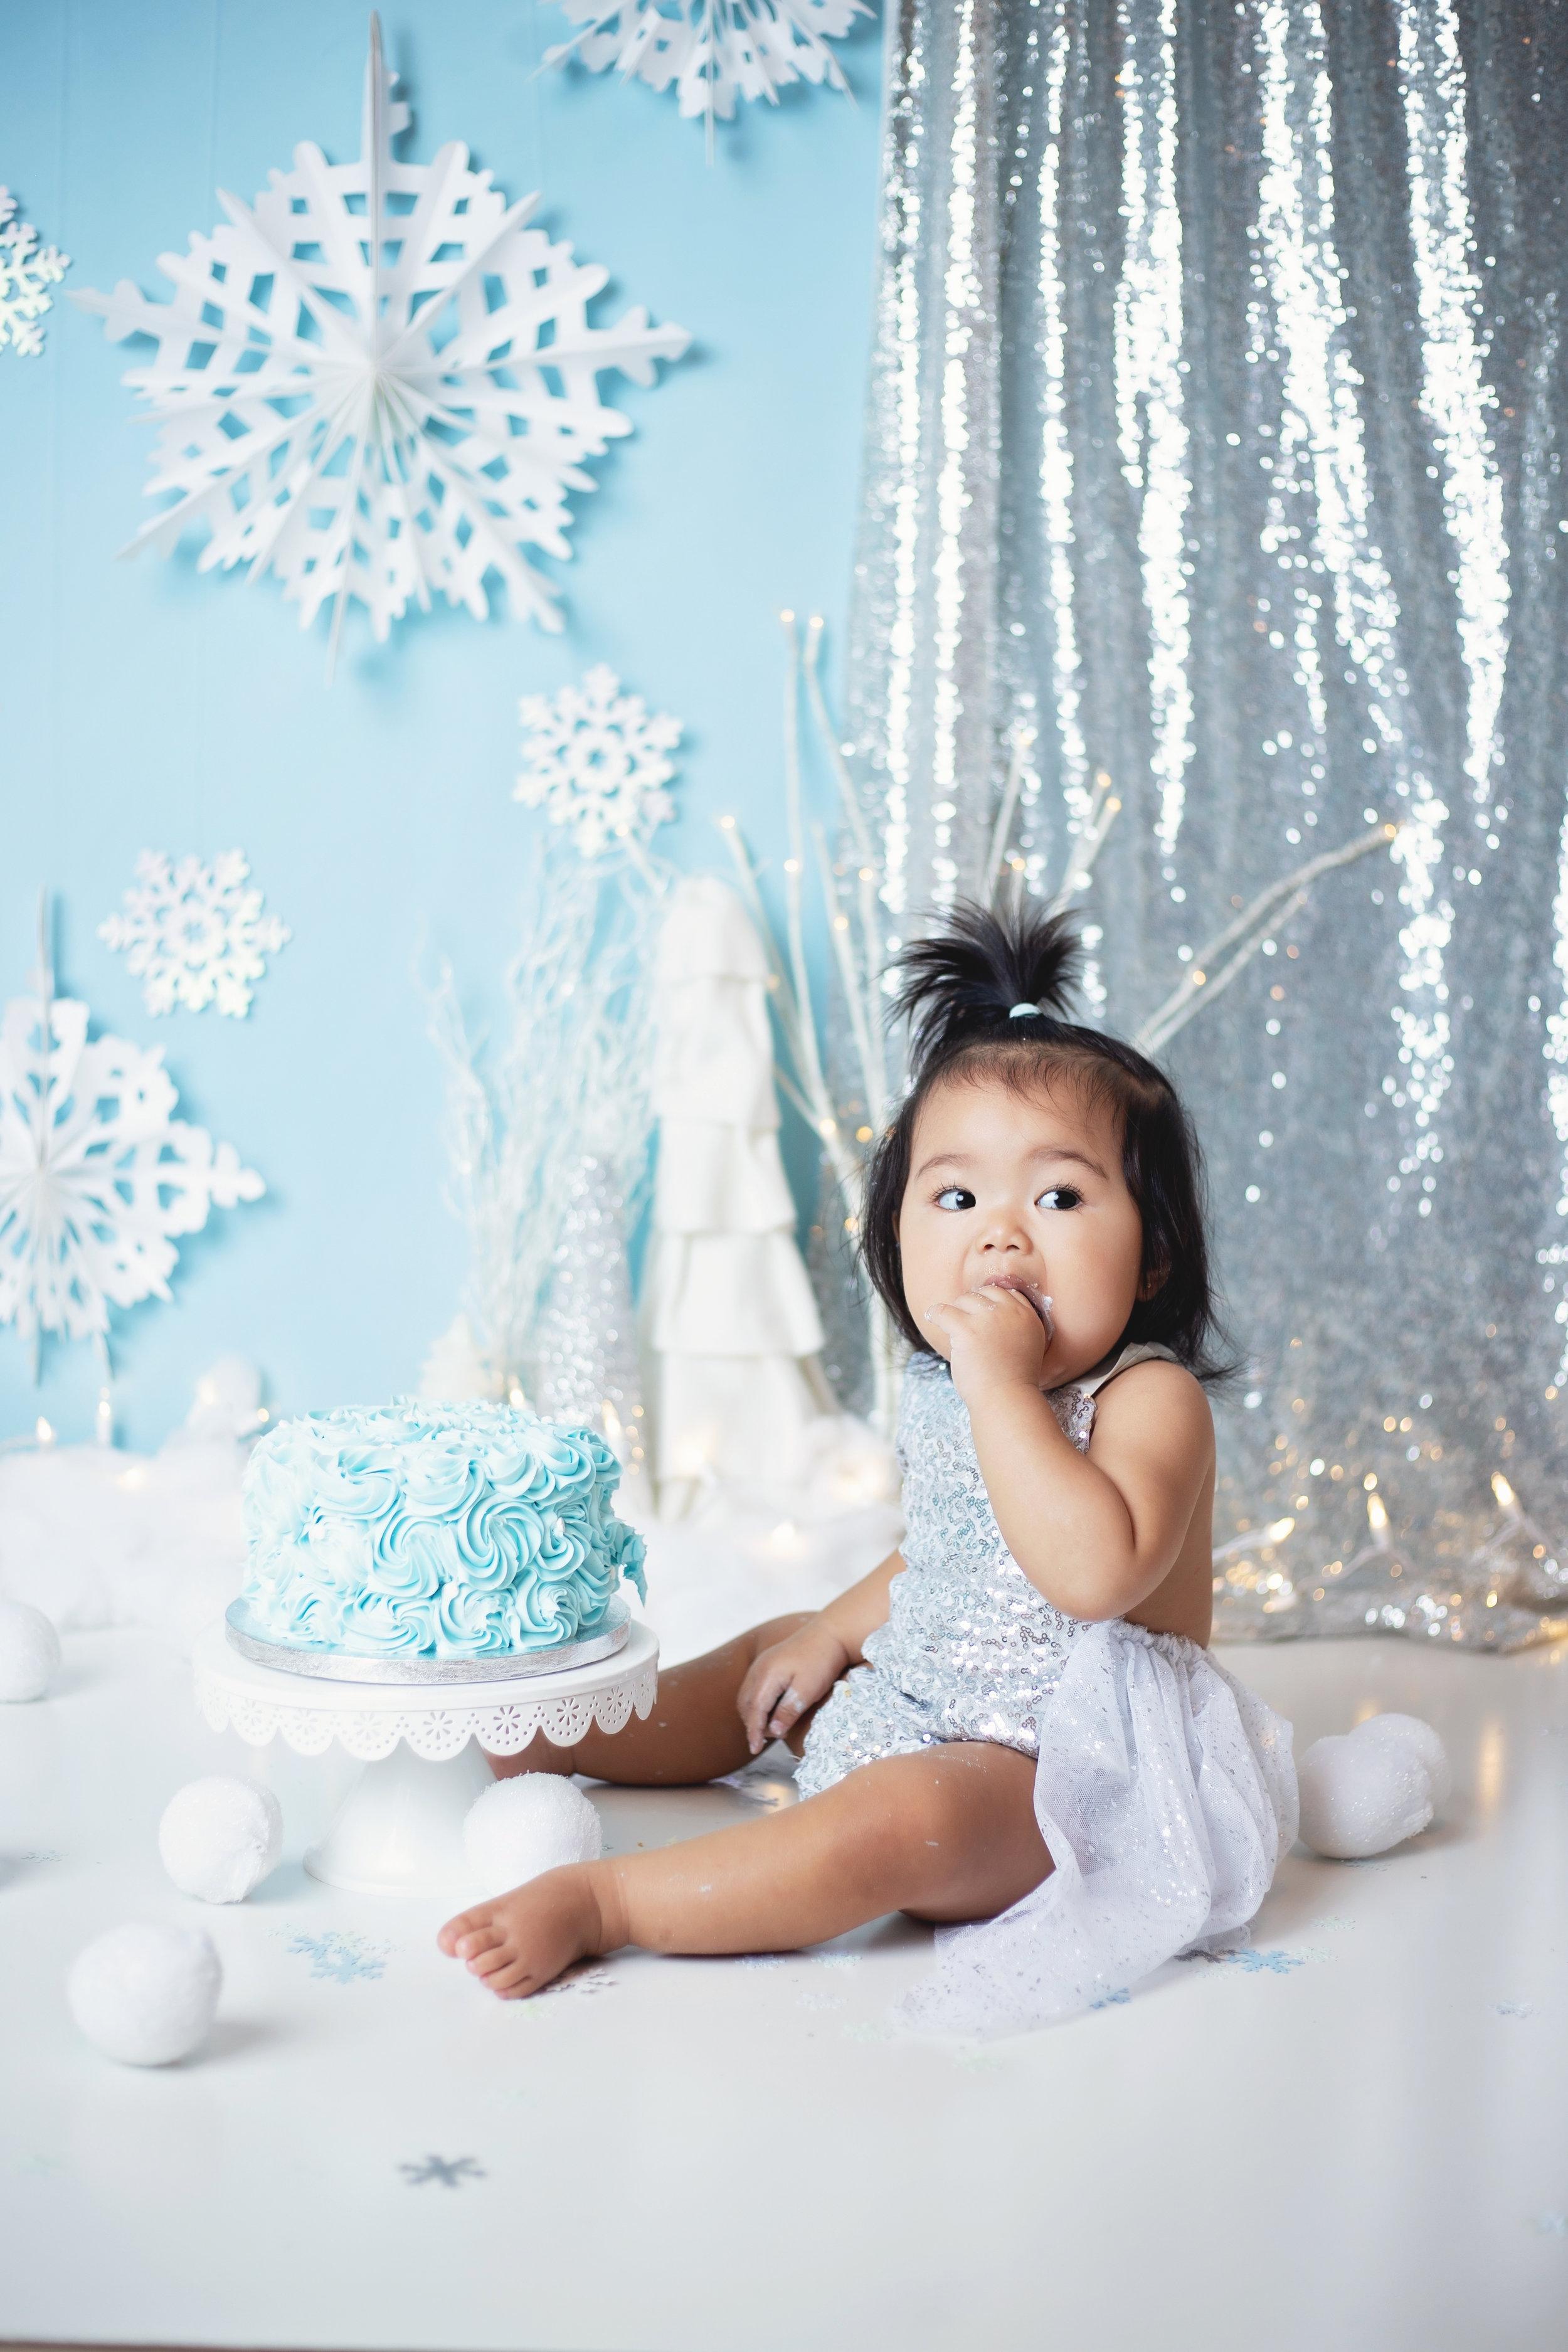 anchorage-cake-smash-photographer-8.jpg